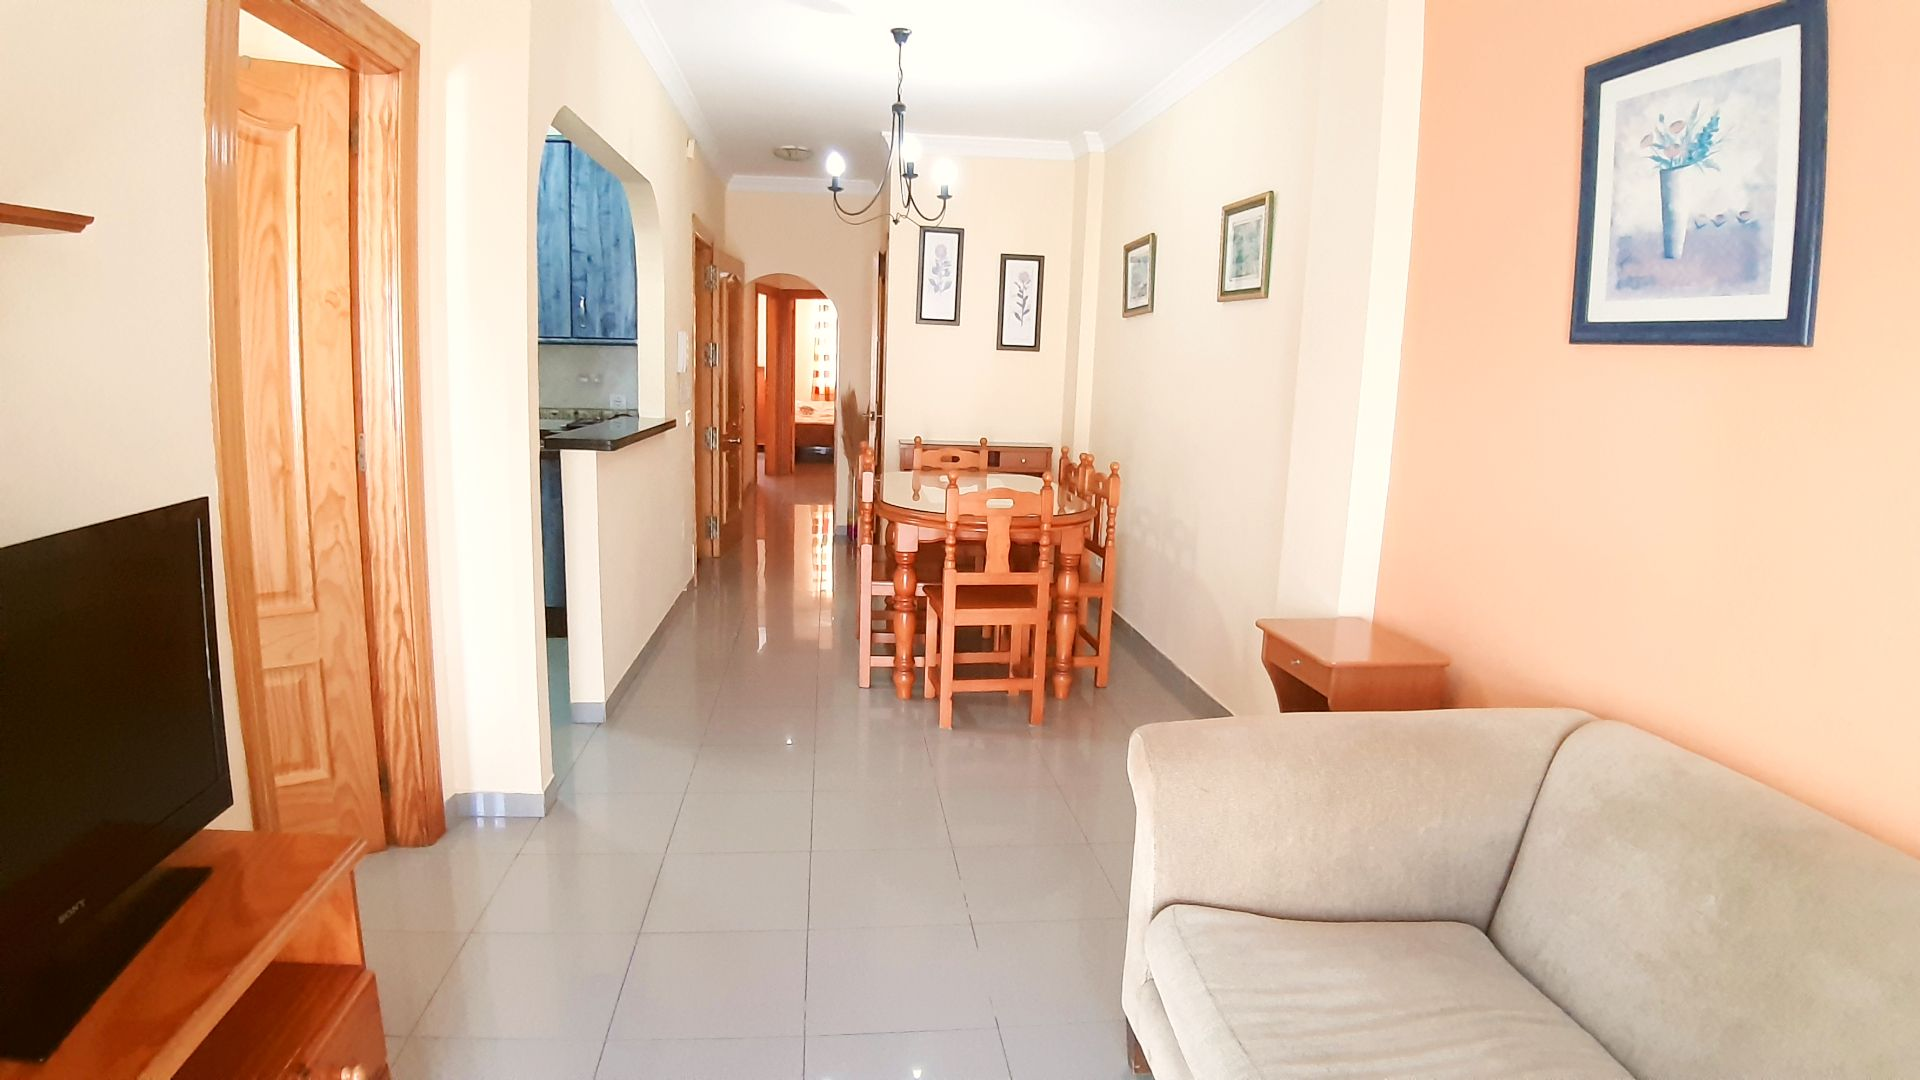 Apartment in Nerja, Centro, for sale